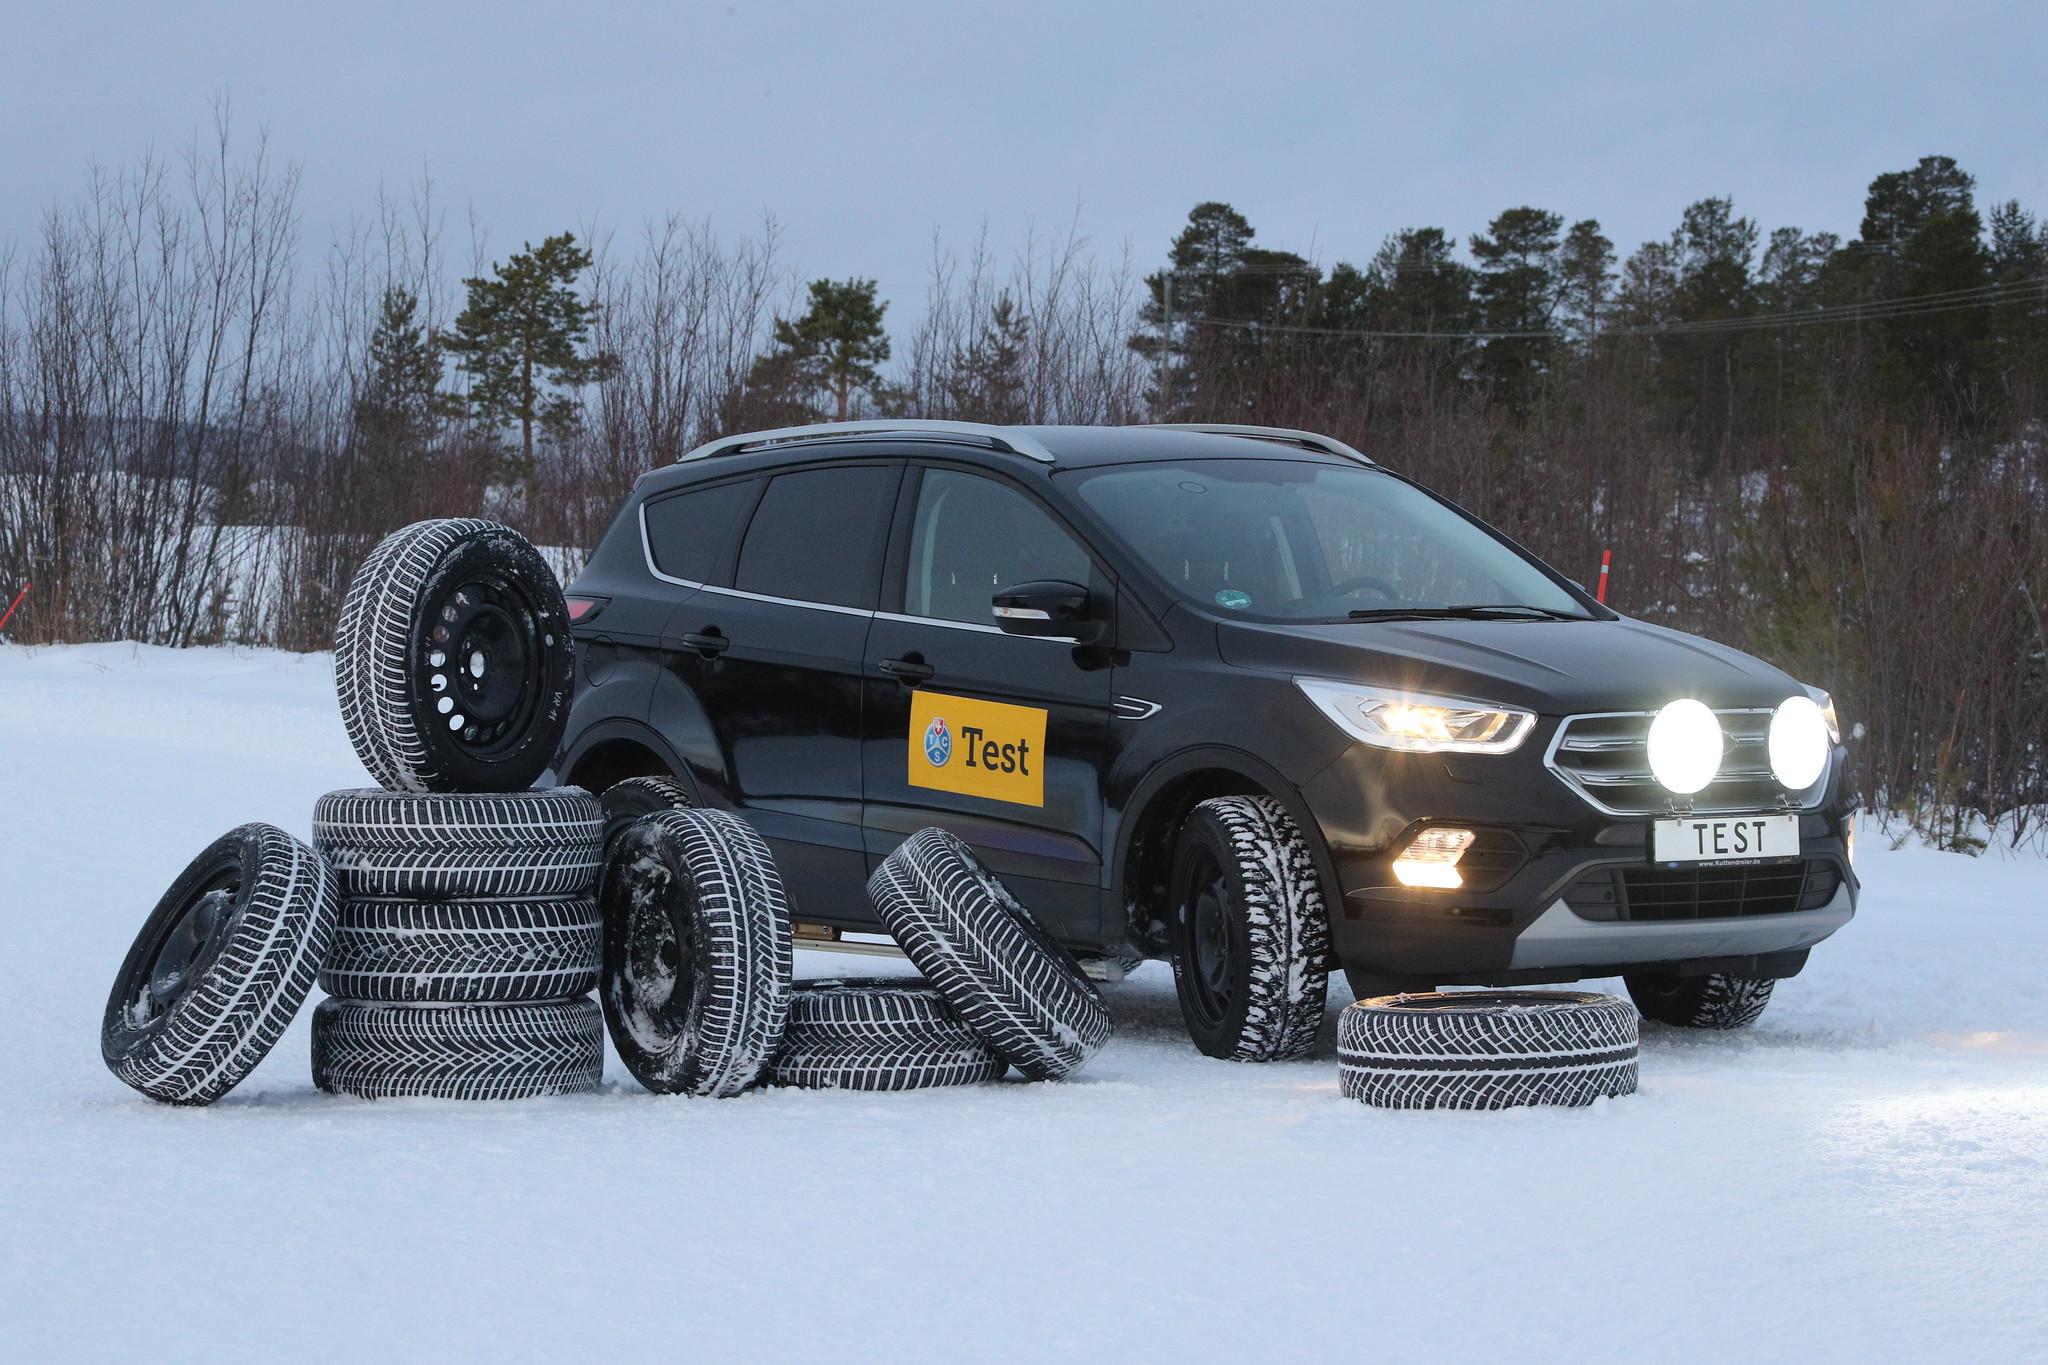 Test TCS pneumatici invernali 2020 – Molteplici lacune su fondo stradale asciutto